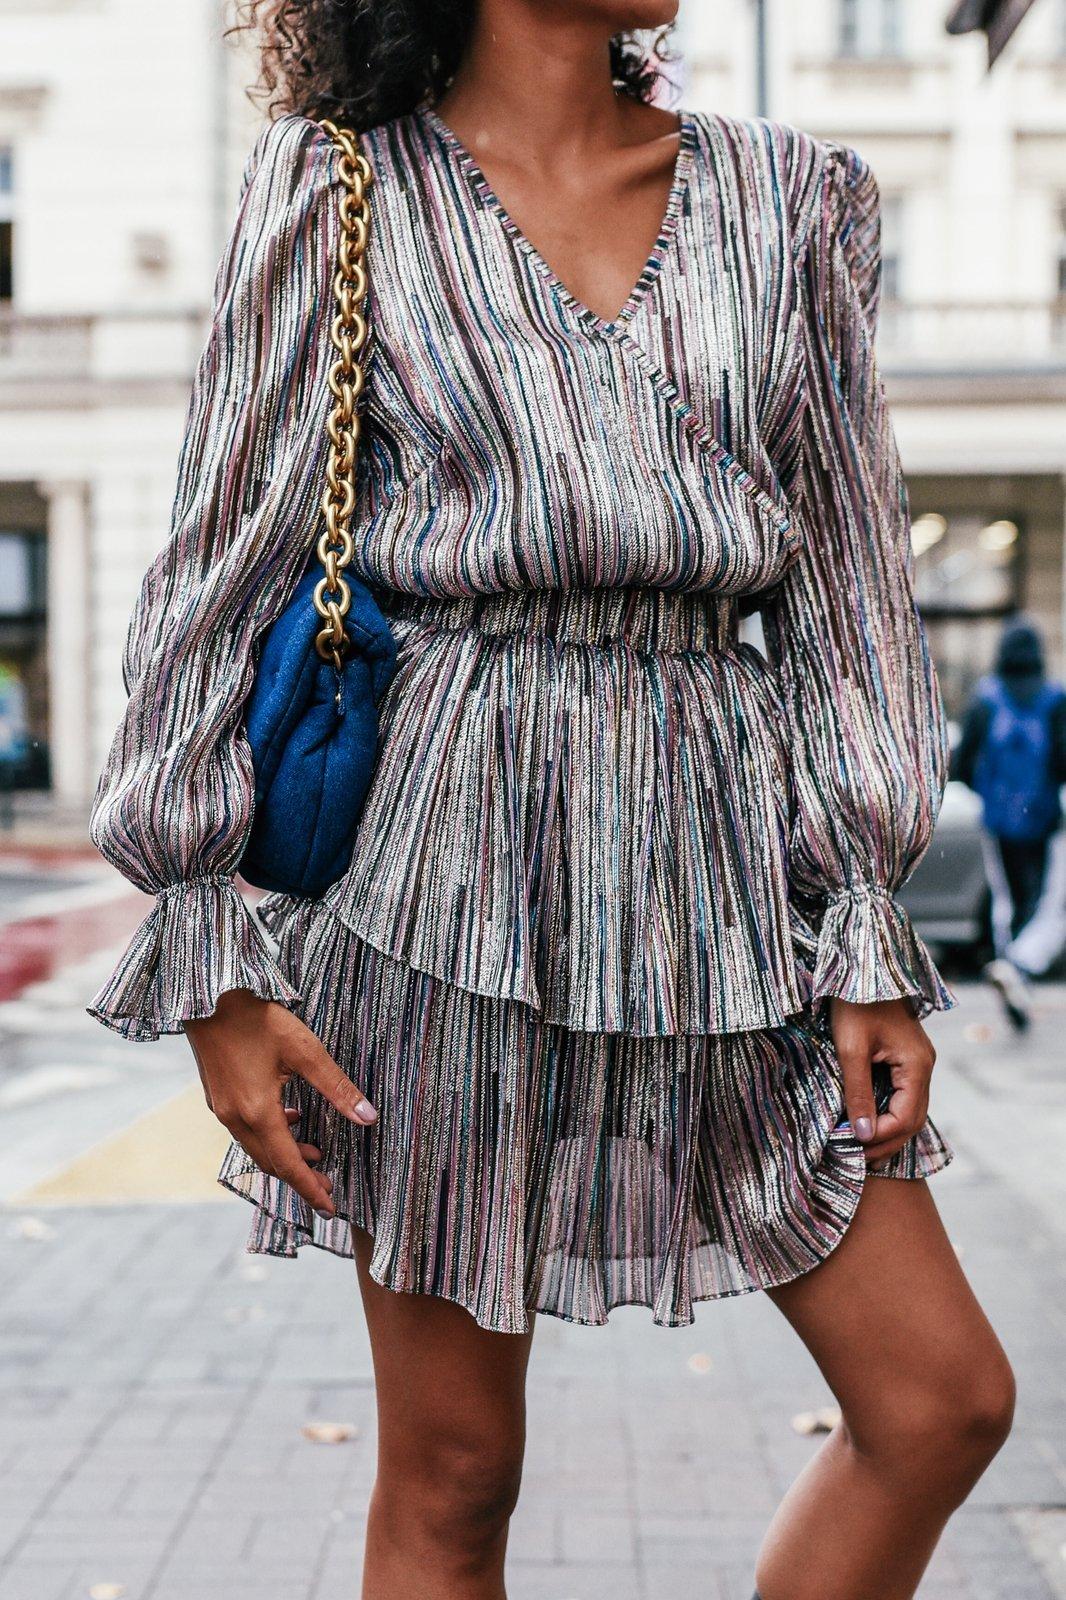 CHEAP Beate Colorful Dress 28617023891 – Women's Dresses & Skirts